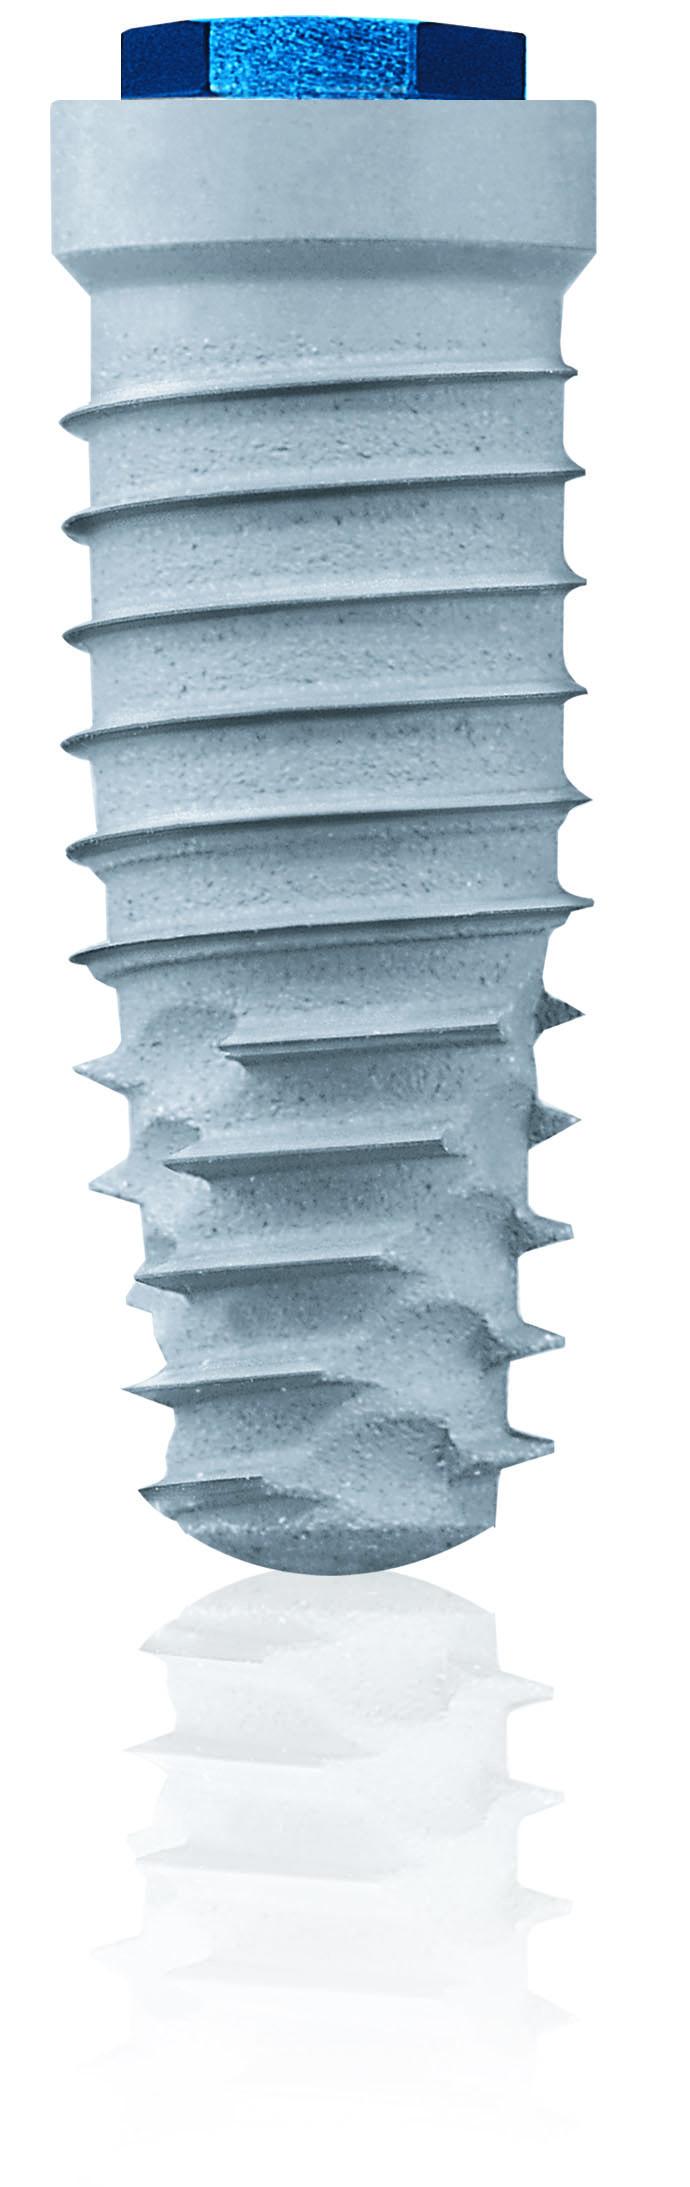 3i T3 External Hex Implant